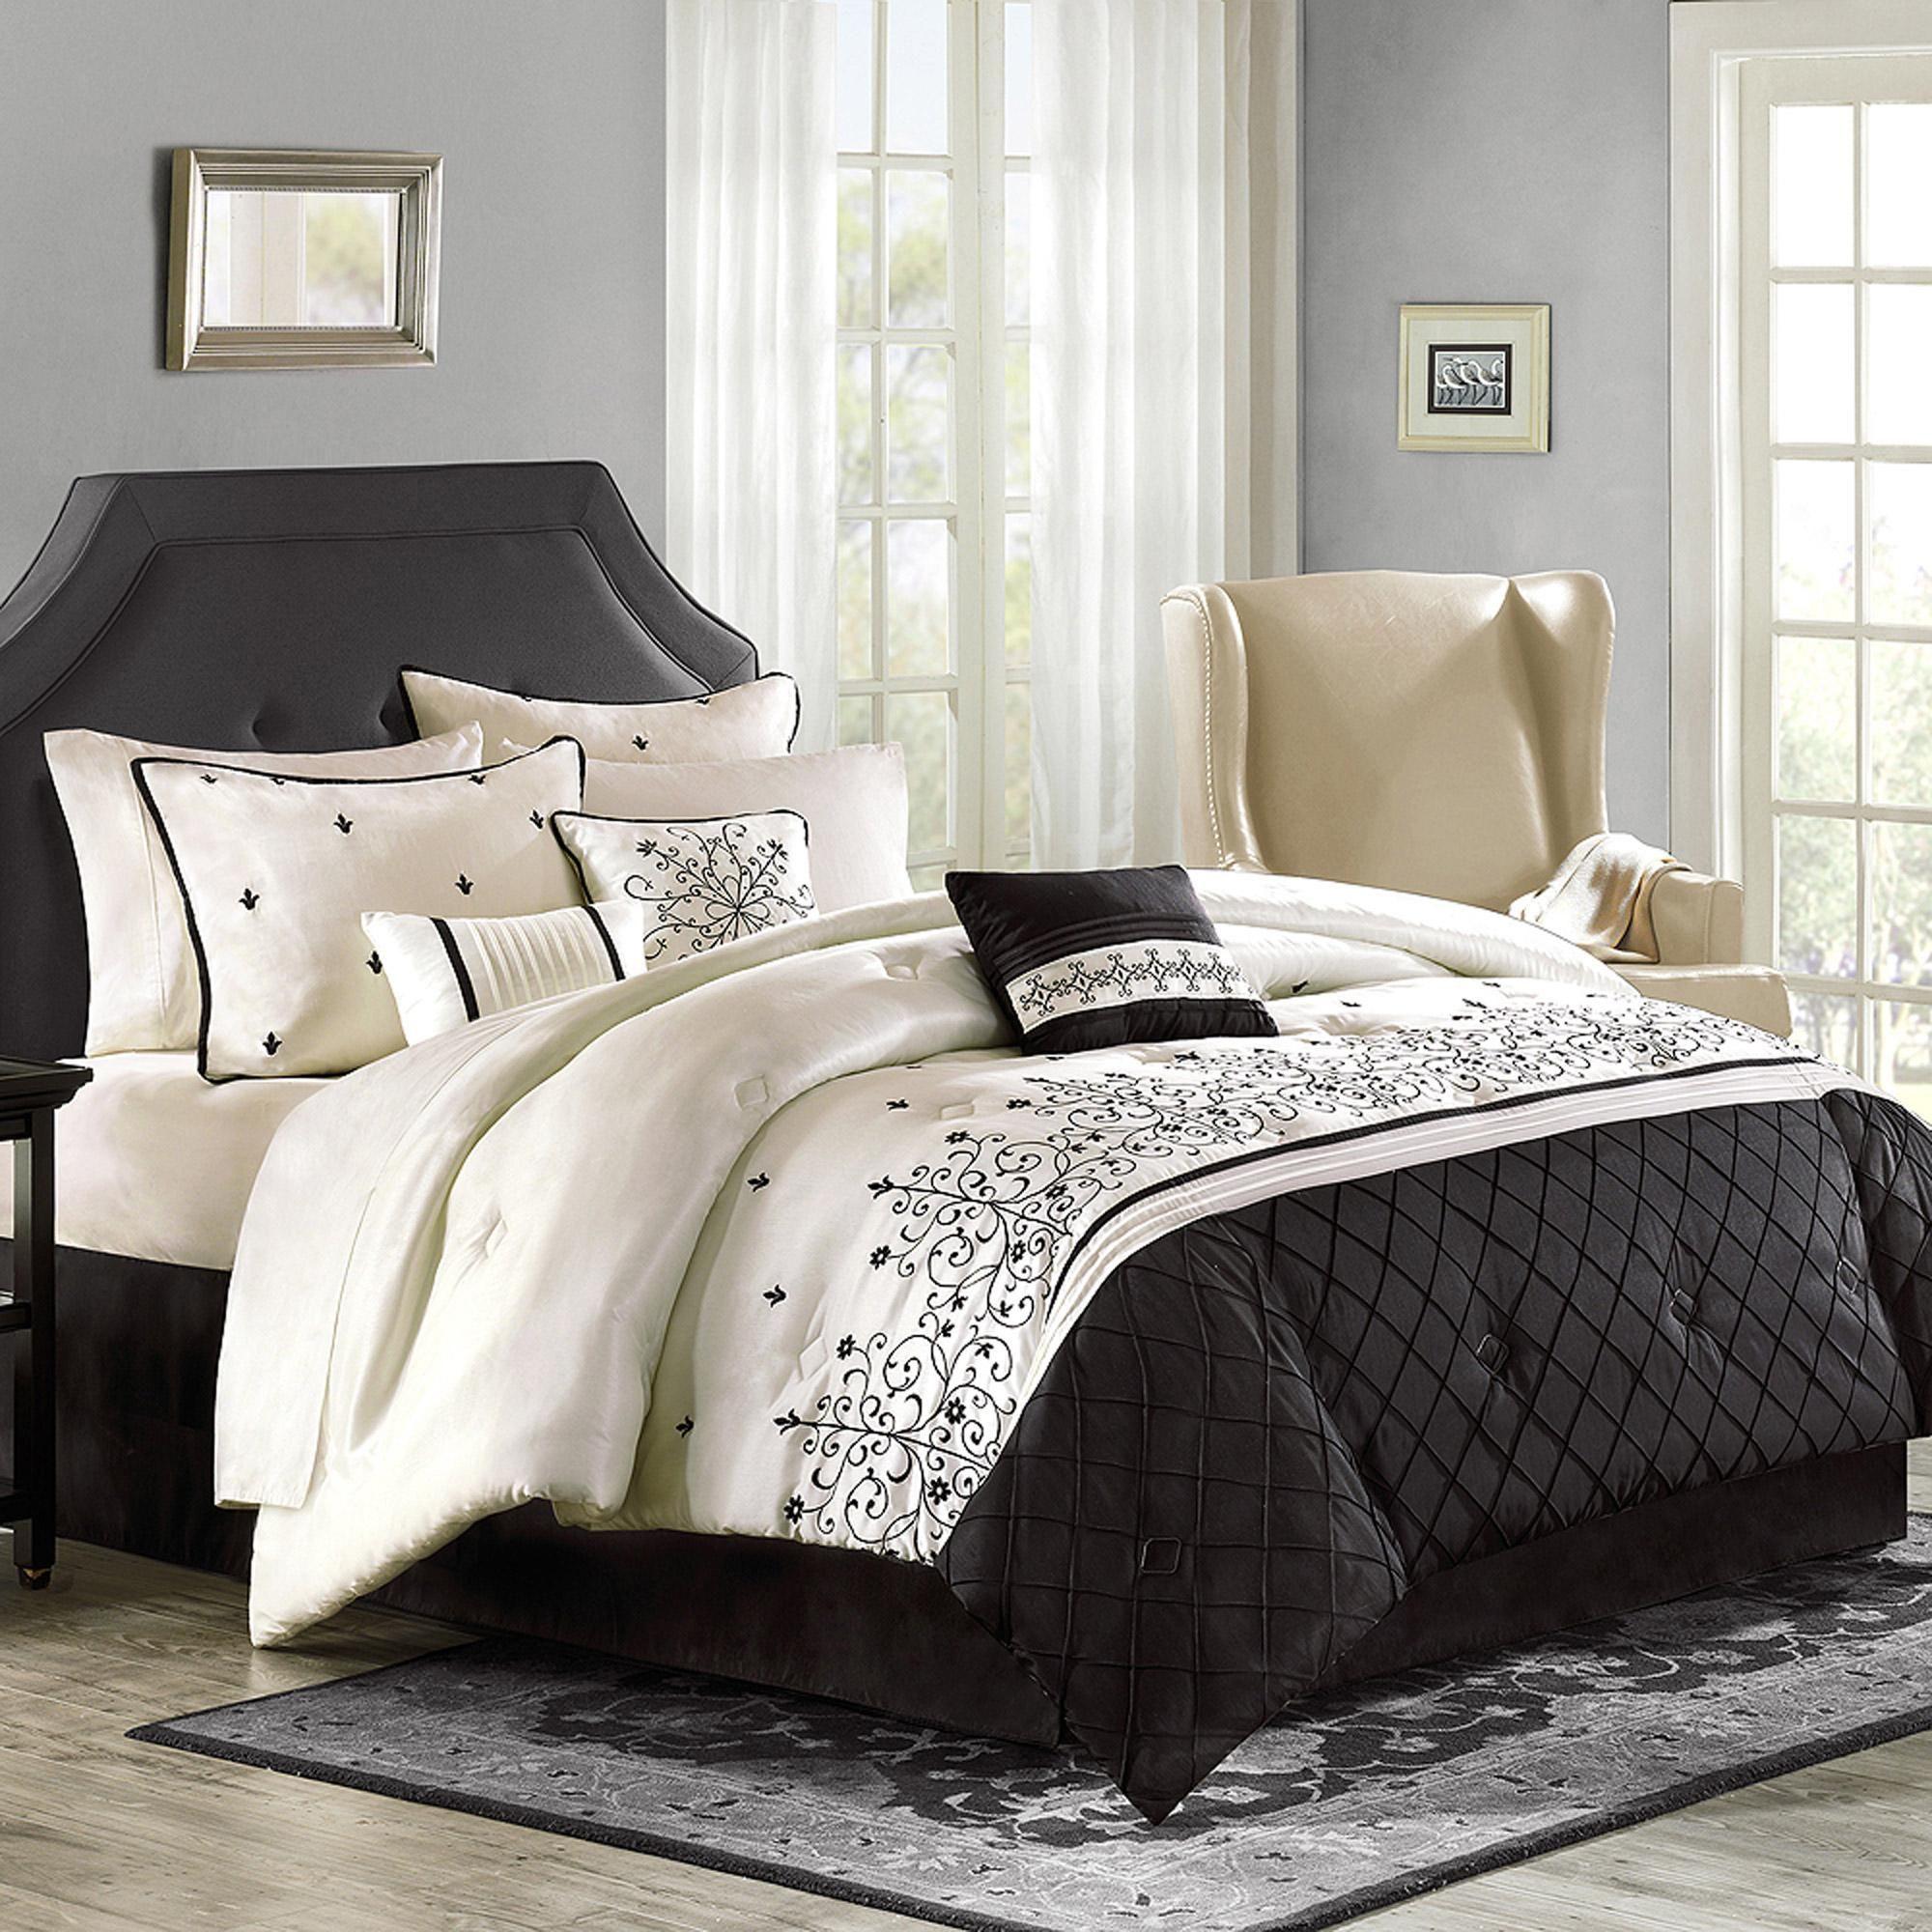 better homes and gardens regent 7piece comforter bedding